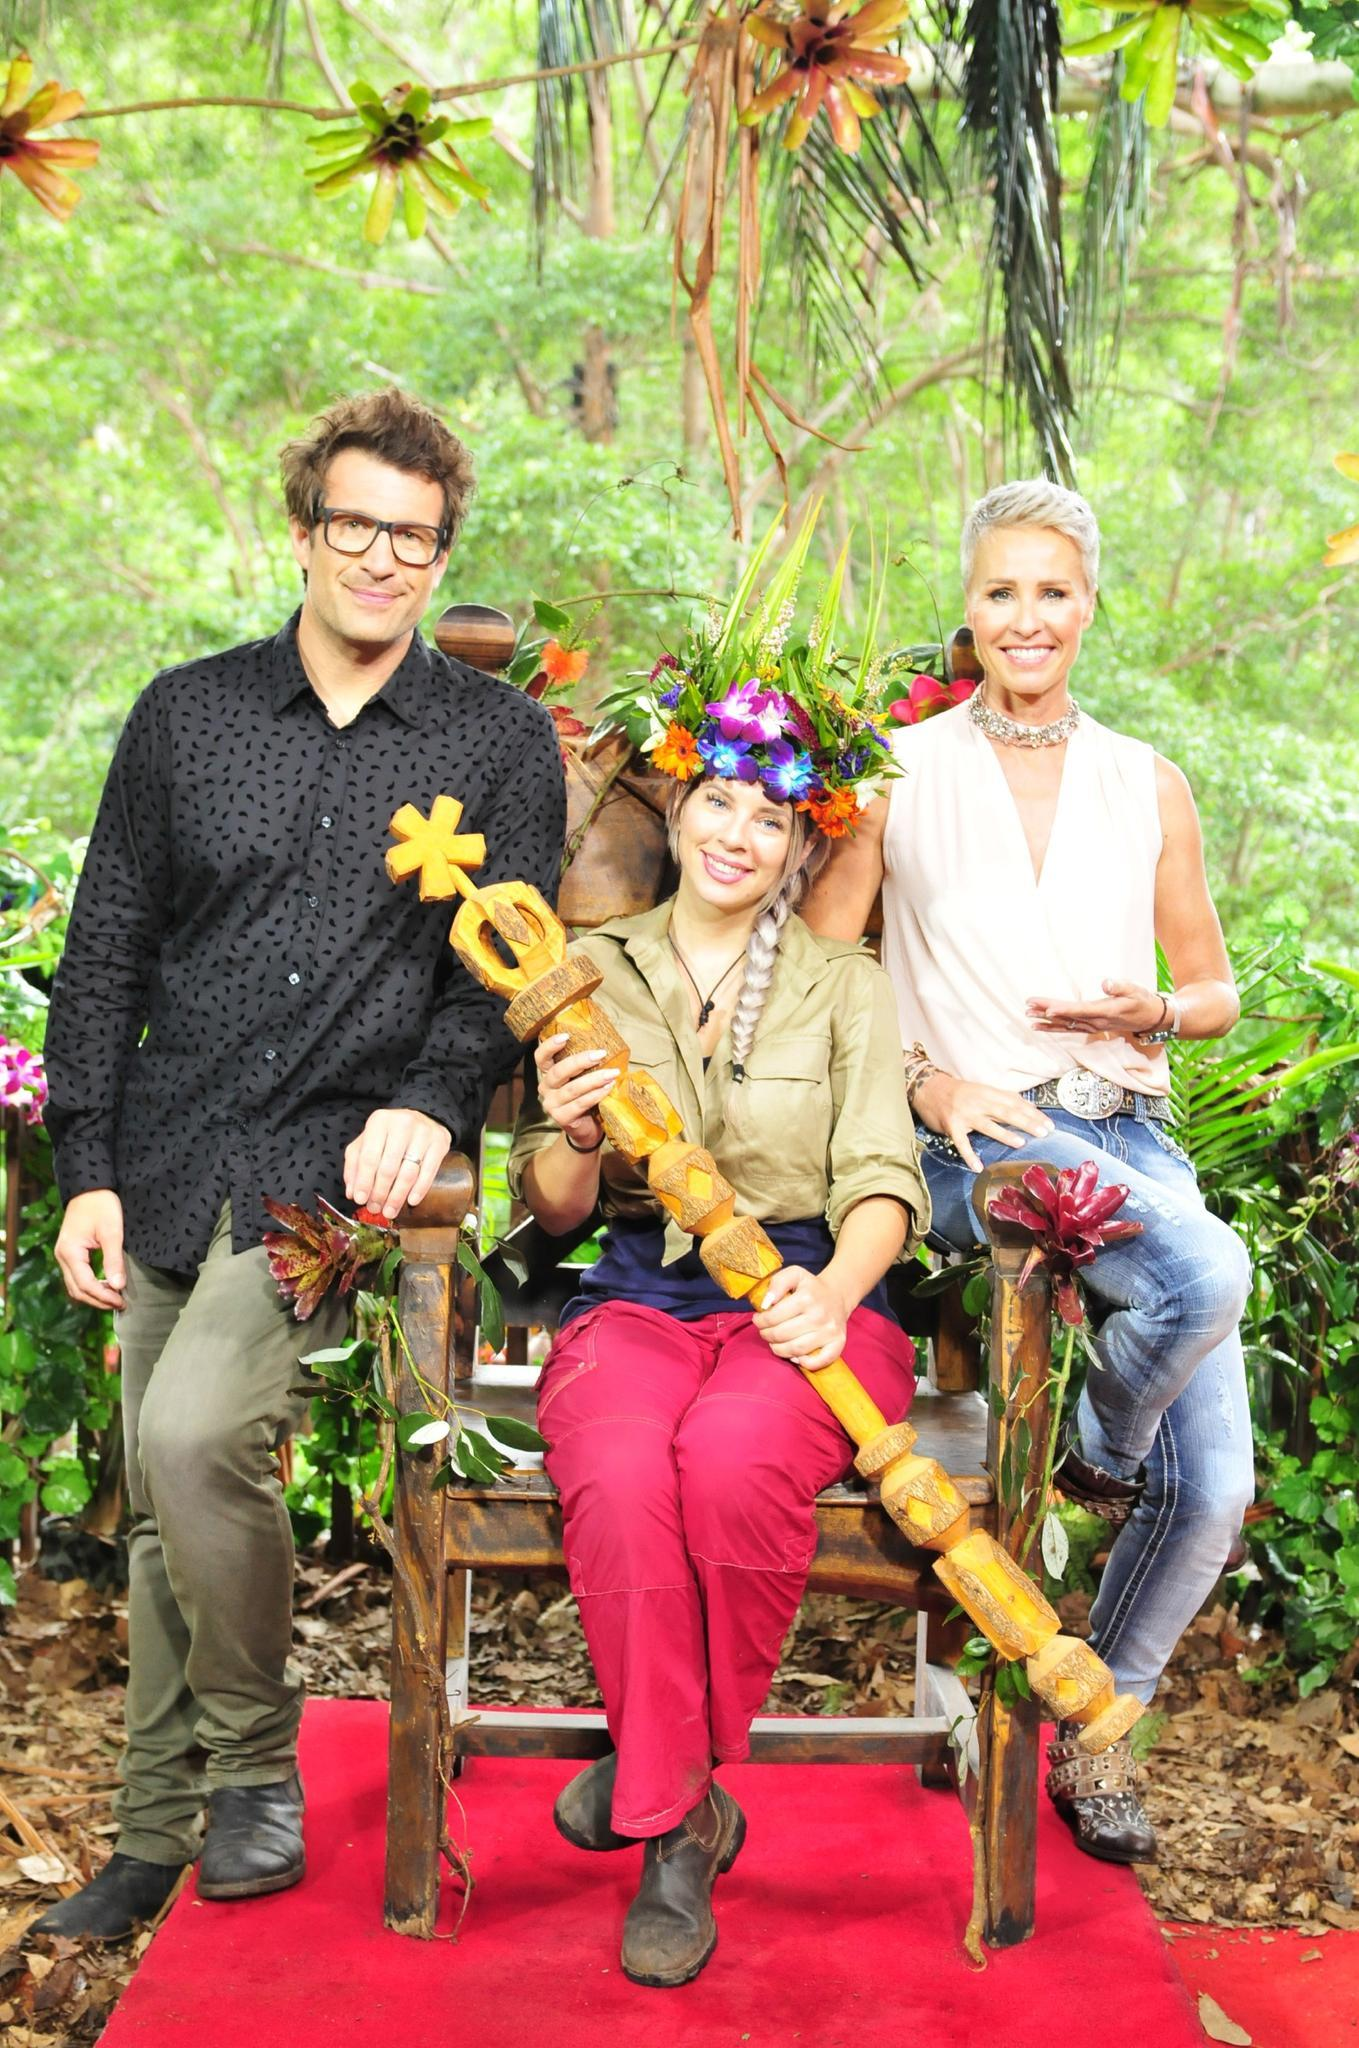 Dschungelcamp Jenny Frankhauser Gewinnt Gala De